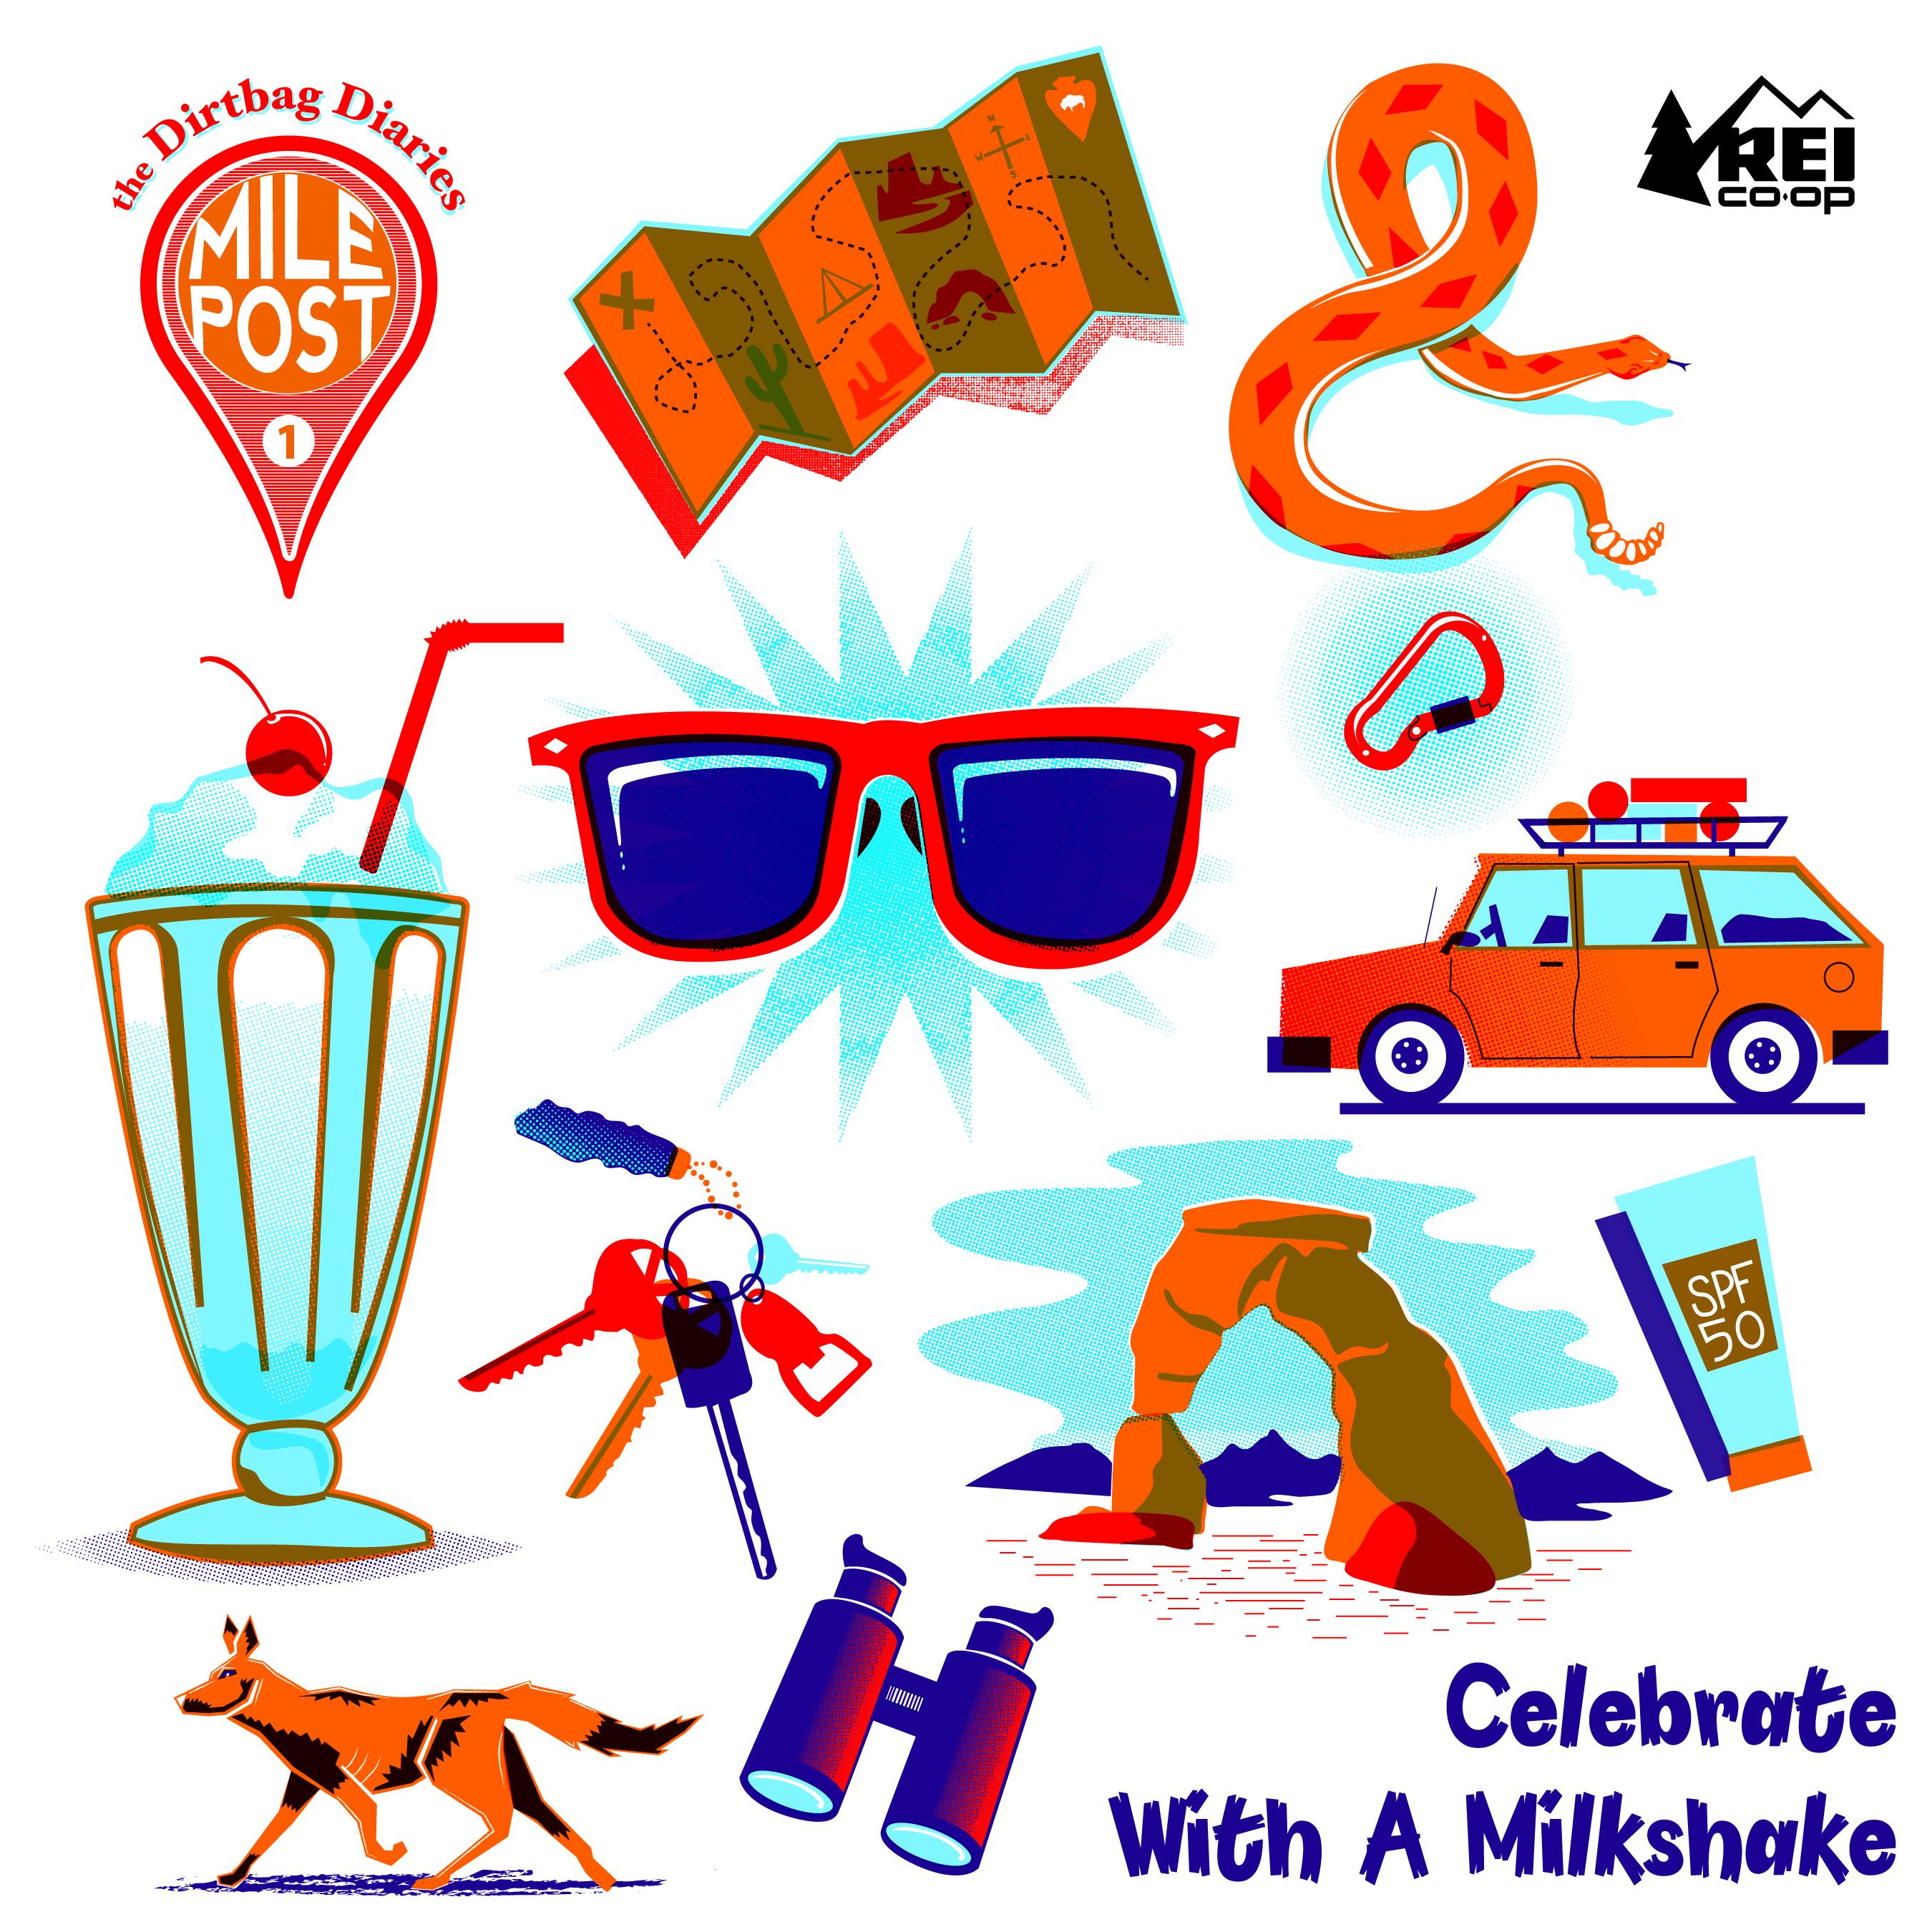 Mileposts--Celebrate with a Milkshake